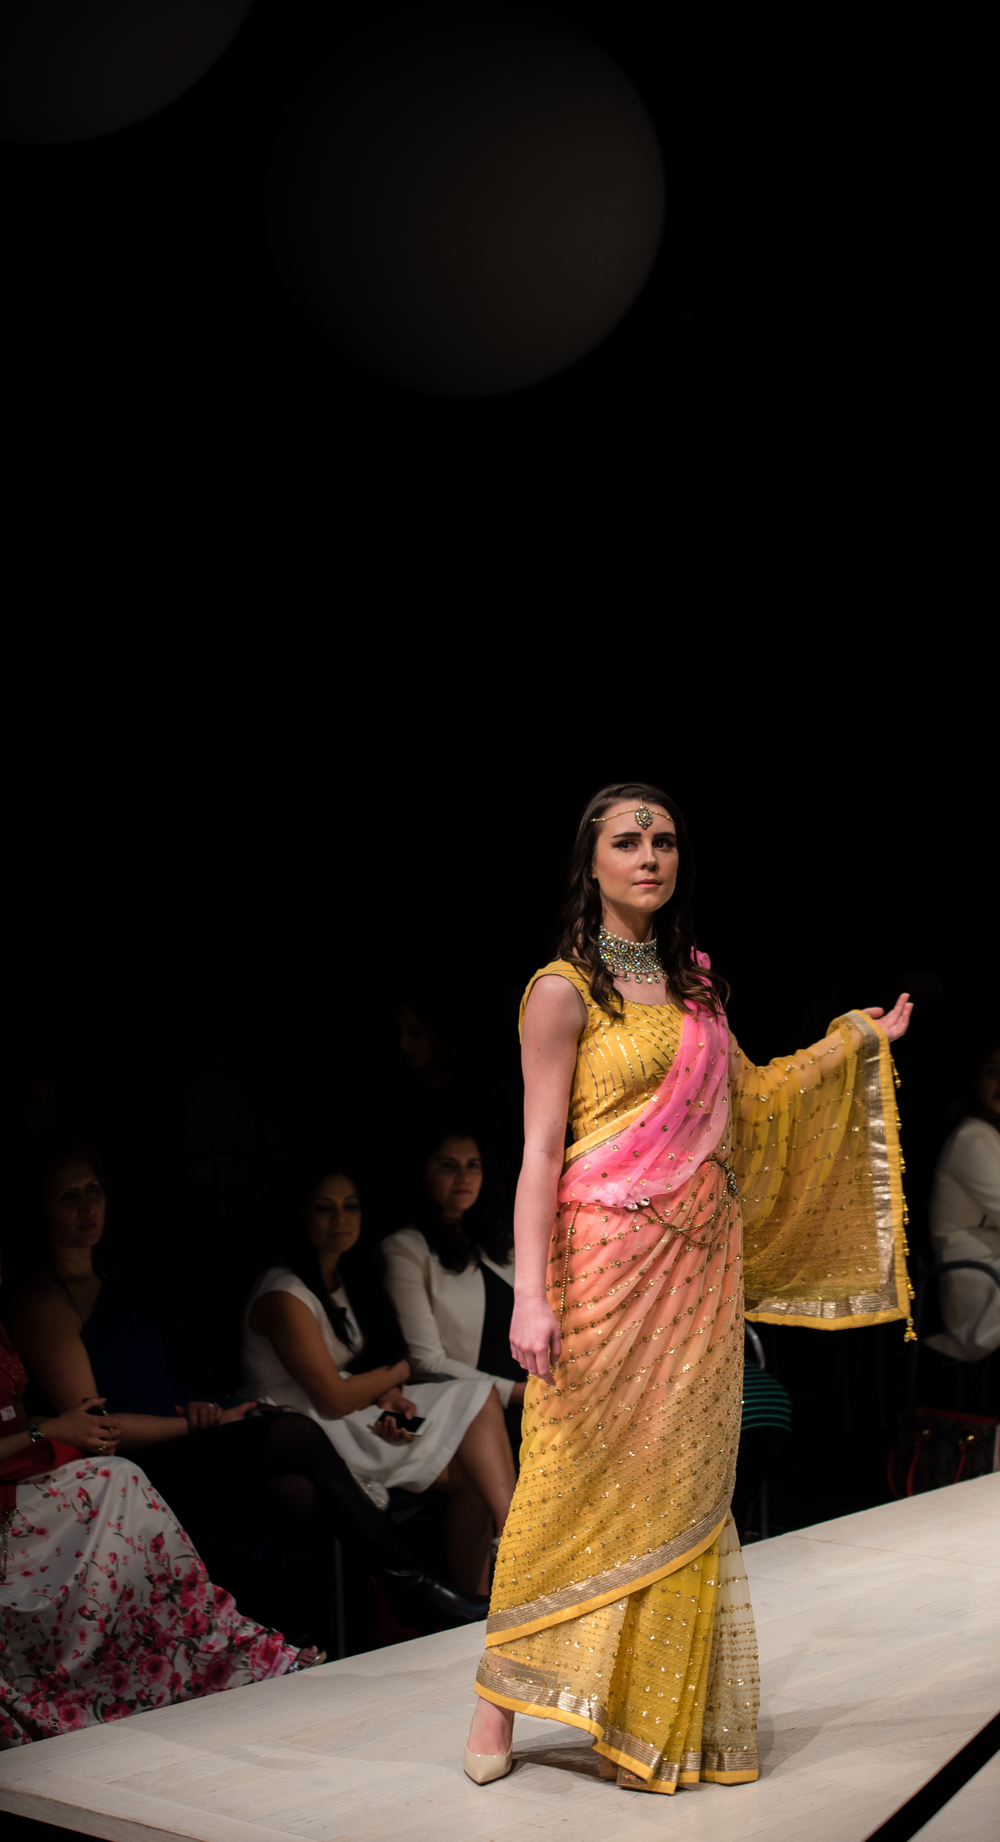 Sher Khan Niazi-WCFW-Designerz Den-3348.jpg